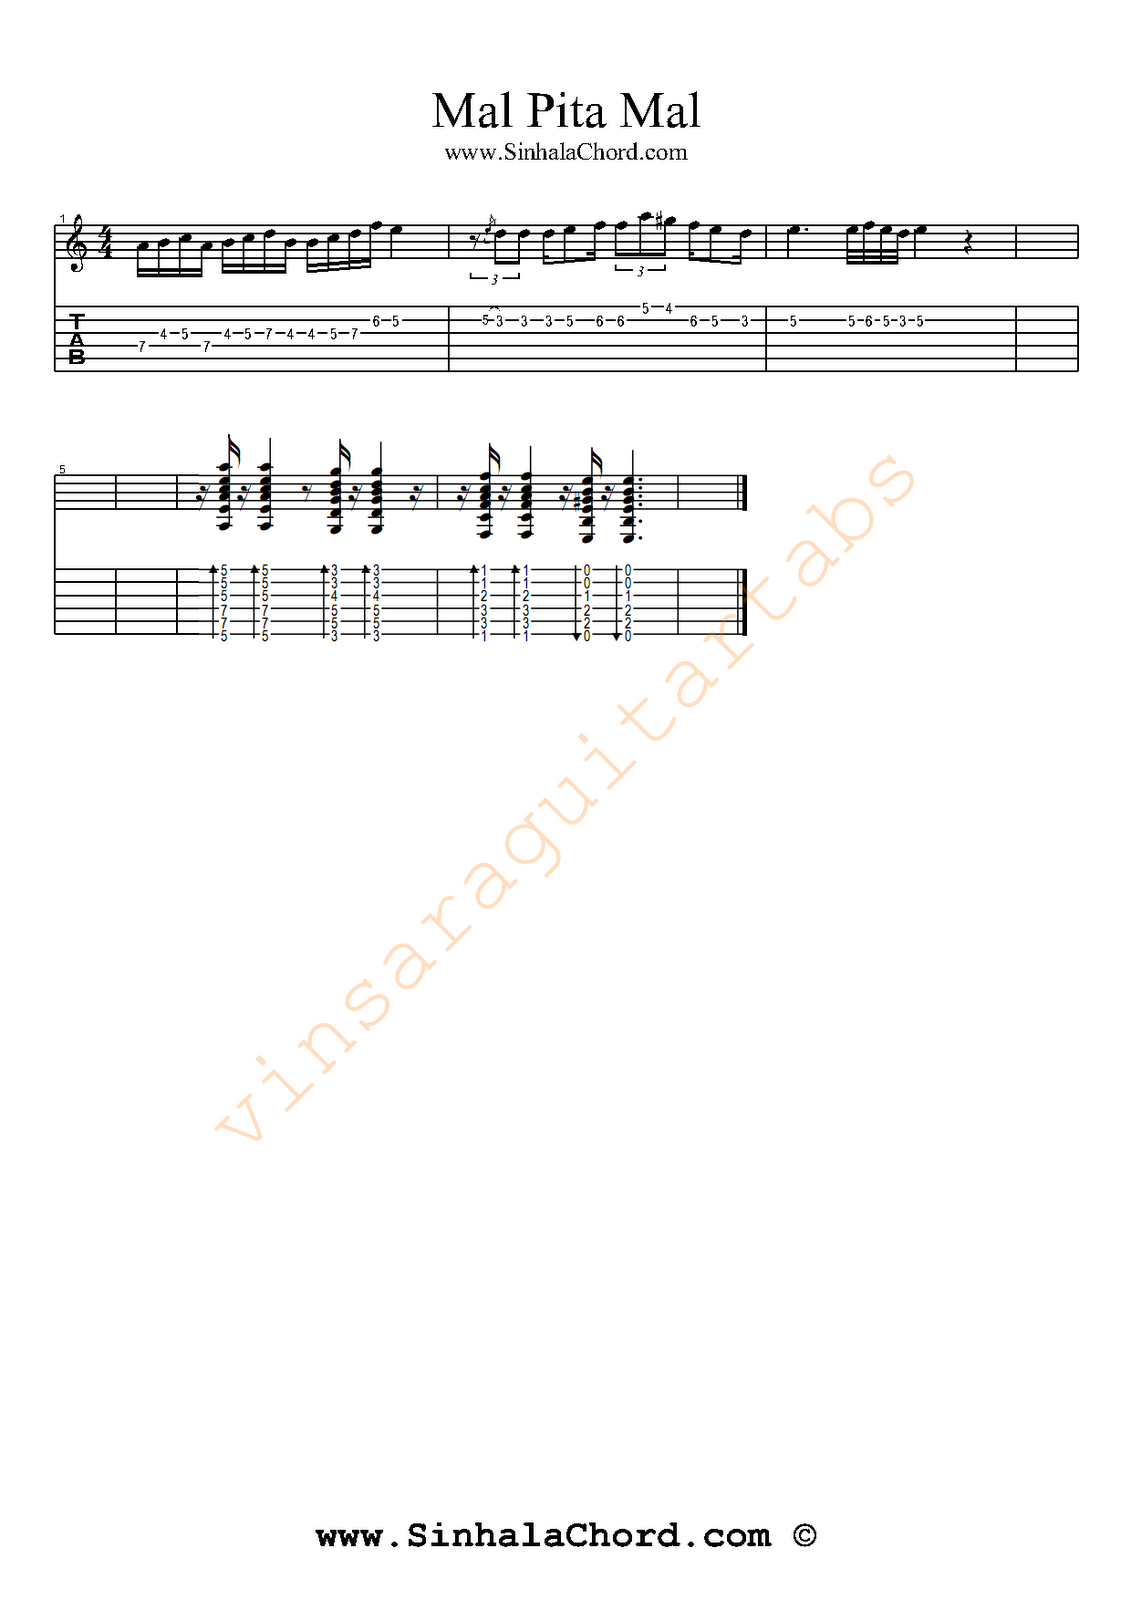 Mal pita mal Guitar Tab : Sinhala Guitar Chords:Sinhala Songs Chords:Guitar Tabs:Sinhala Midi Tracks